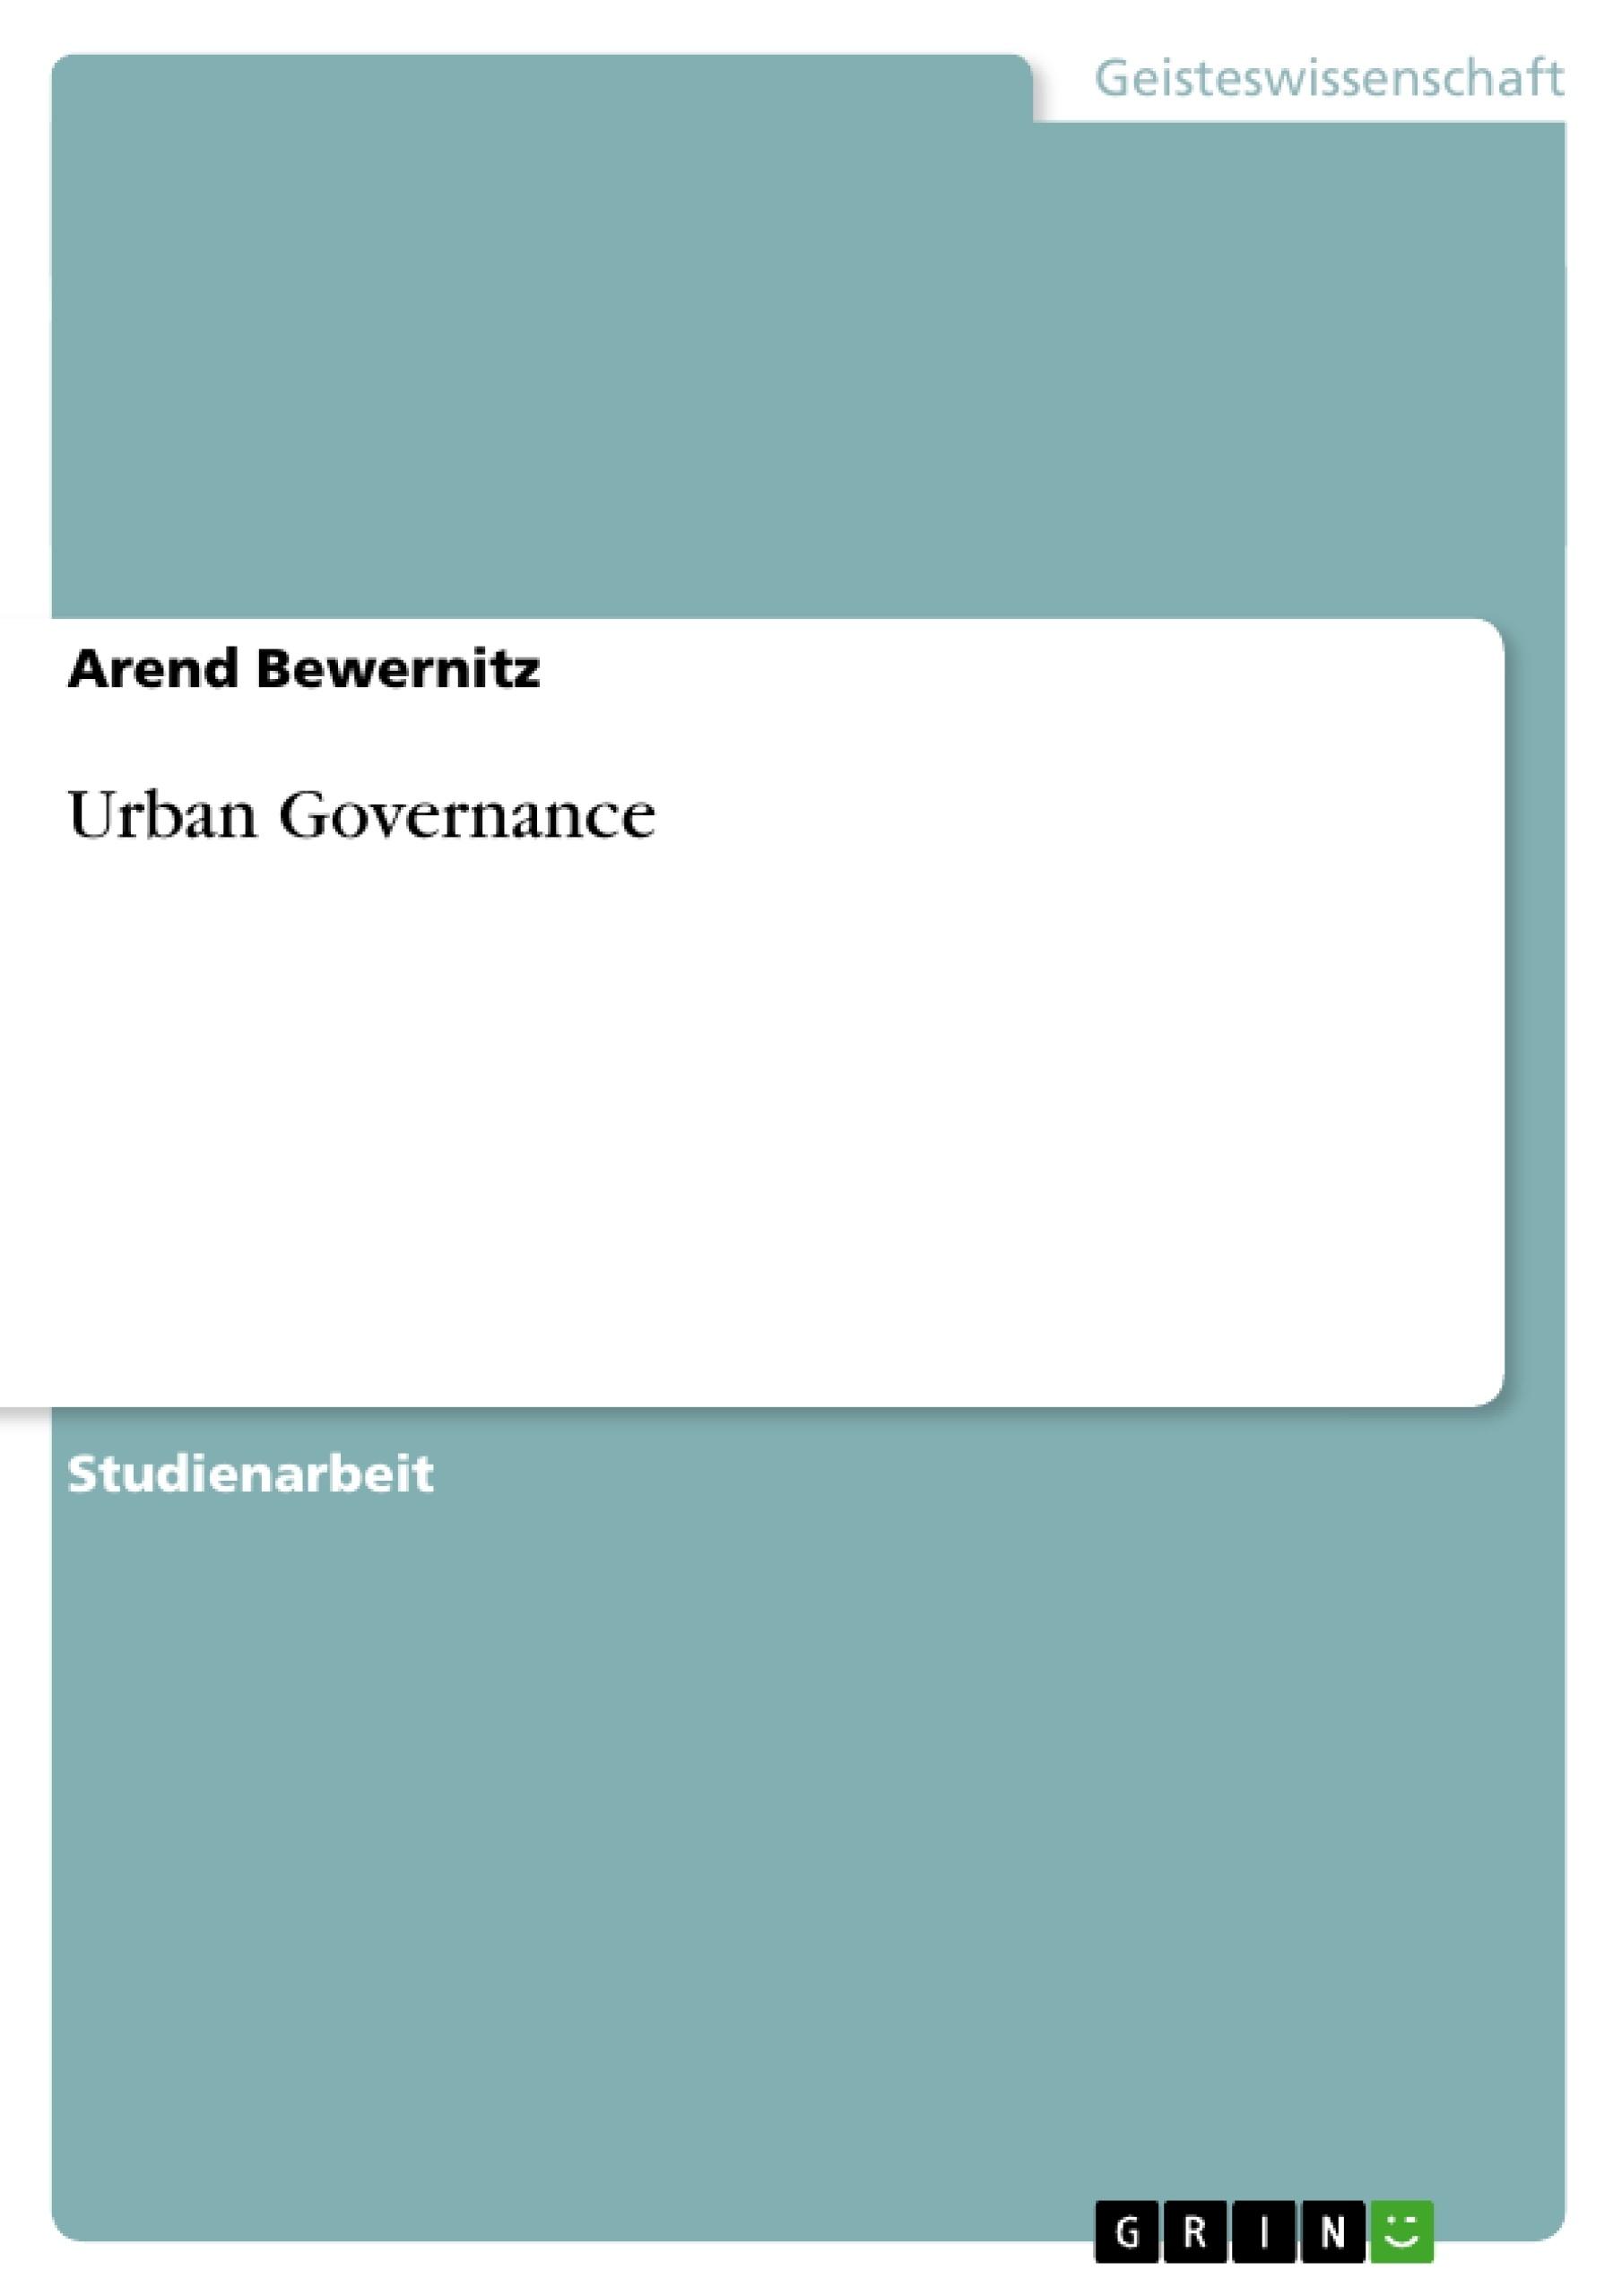 Titel: Urban Governance